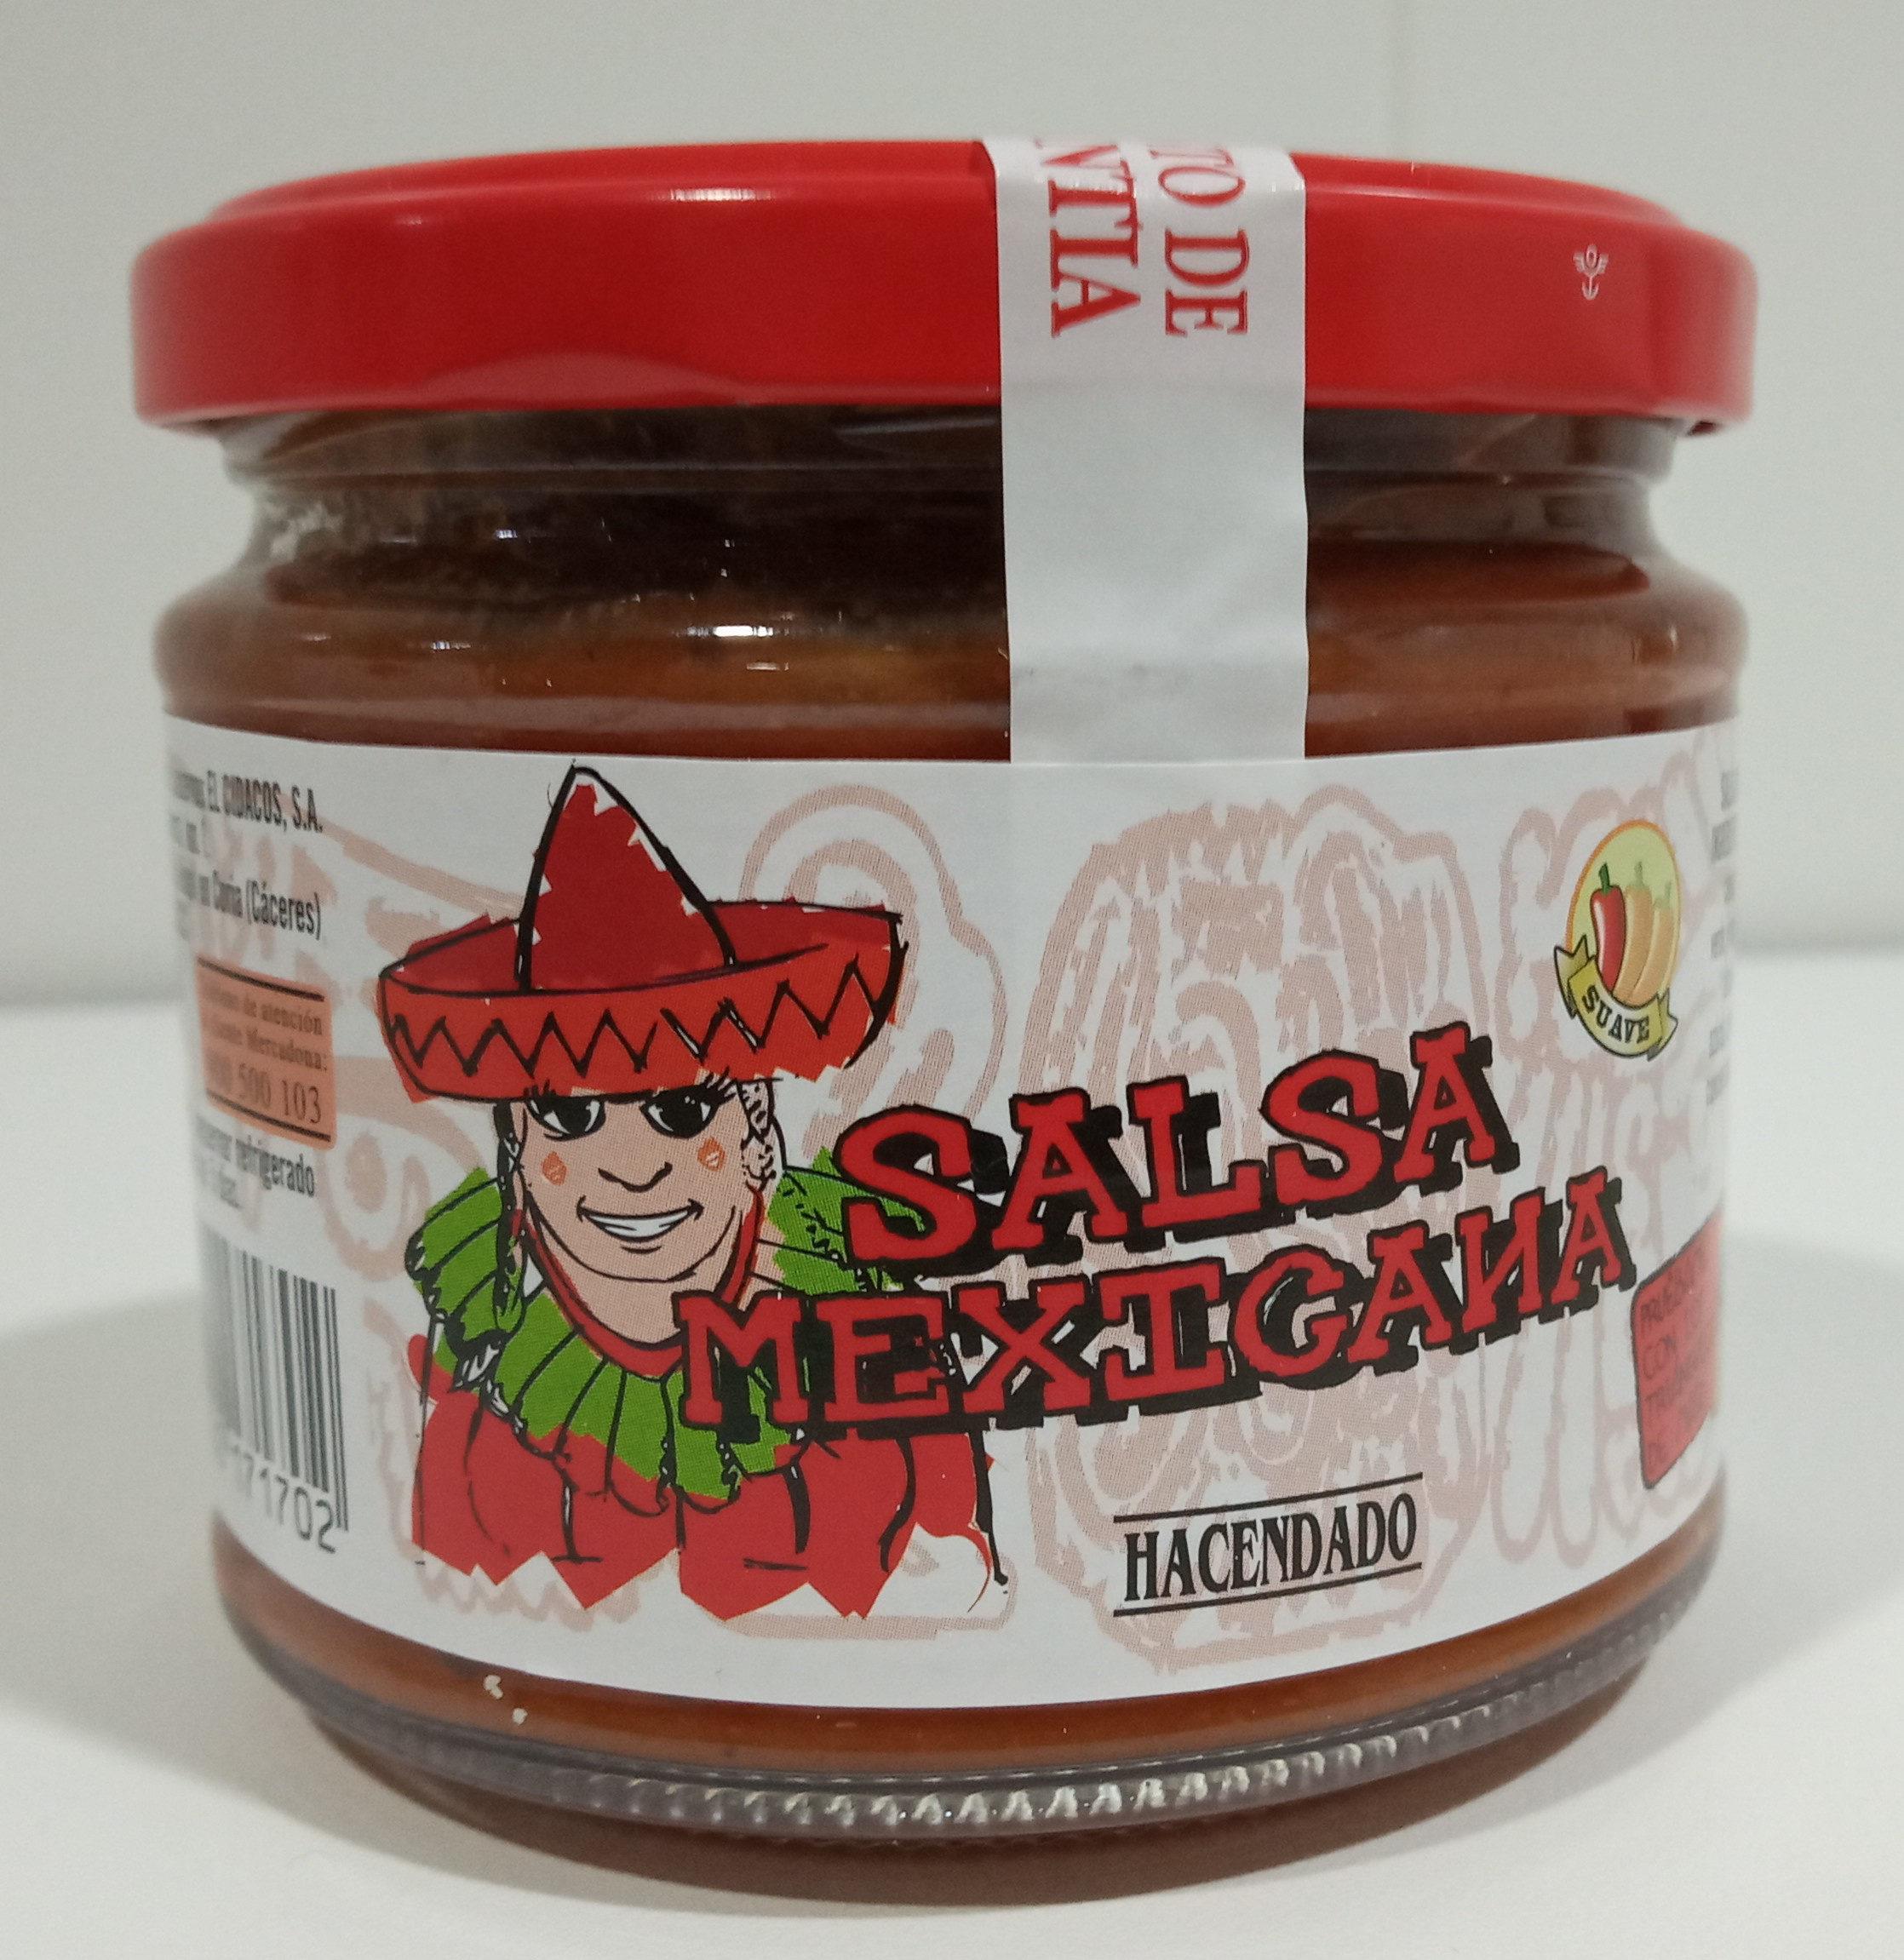 Salsa mexicana suave - Producte